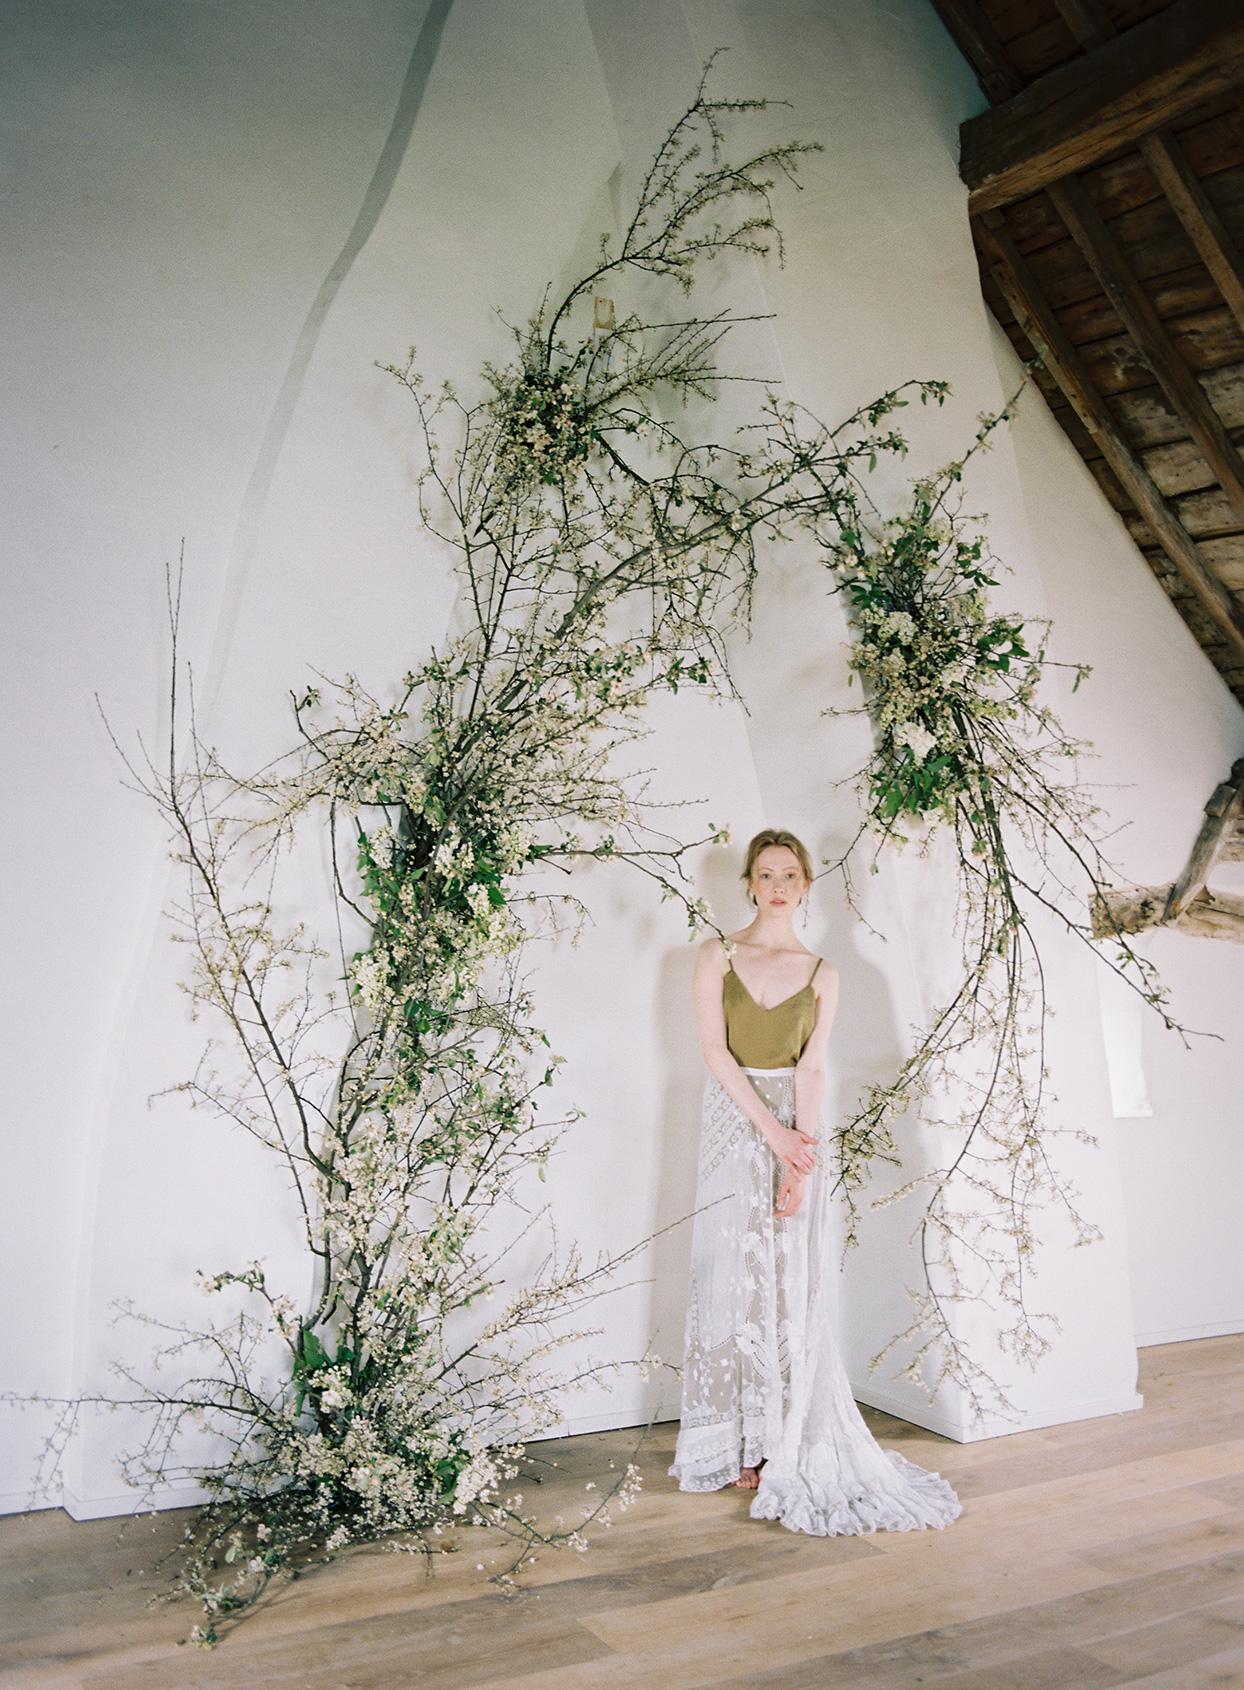 twig branch on wall altar area